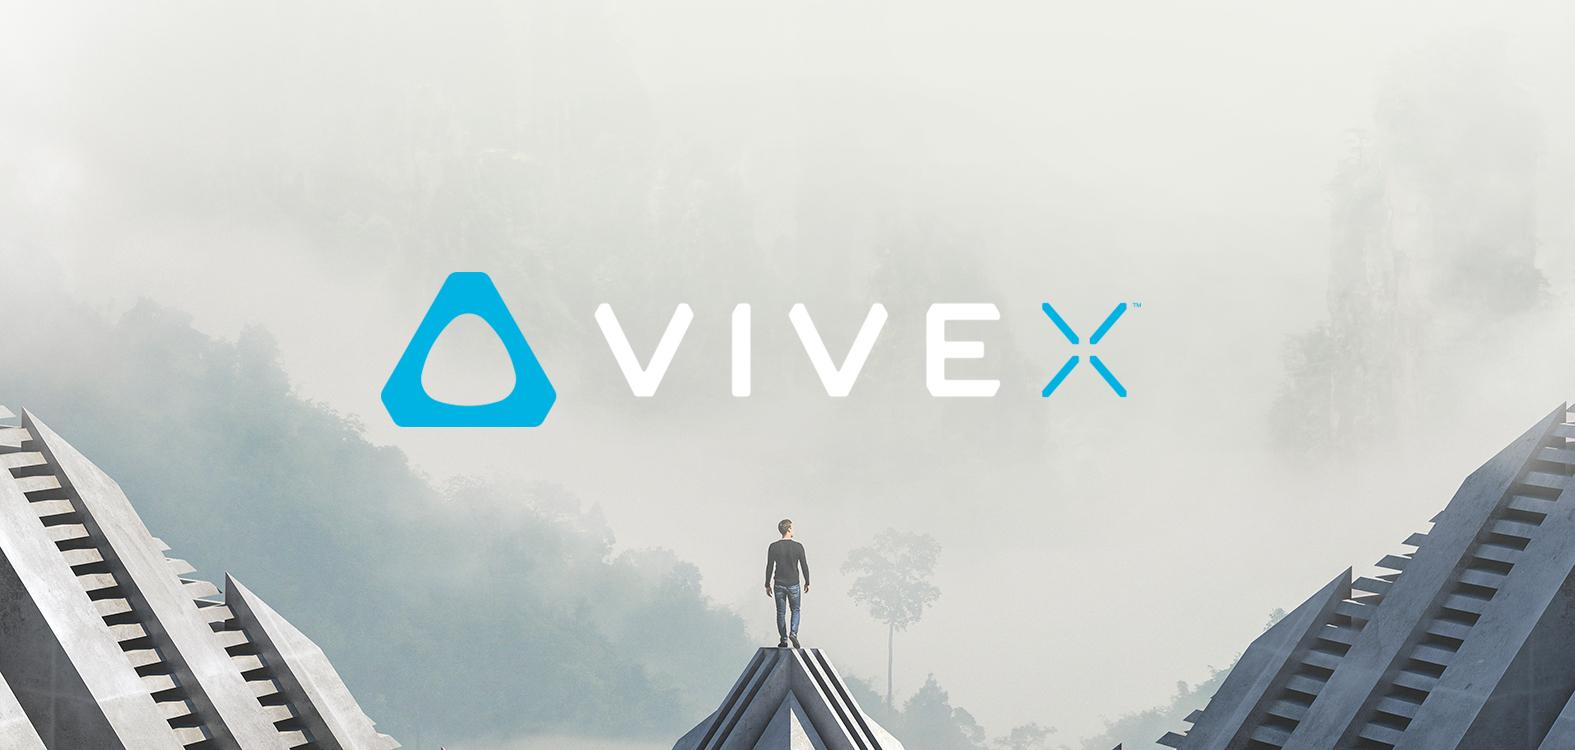 PlusOne x Vive X